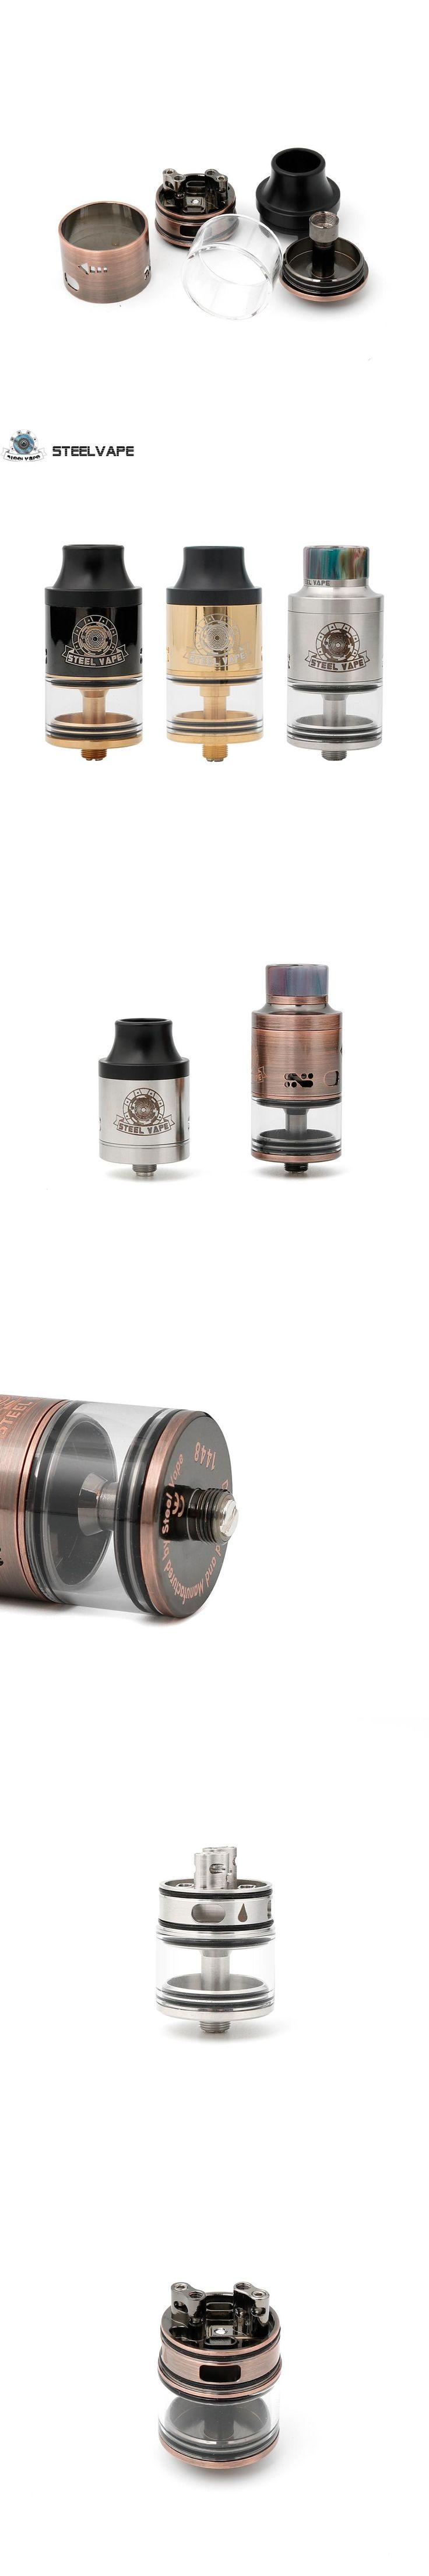 Original Steel Vape Series Tailspin RDTA 25mm RTDA RDA Electronic Cigarette Atomizer for Mechanical Mod Box Mods Kit Best